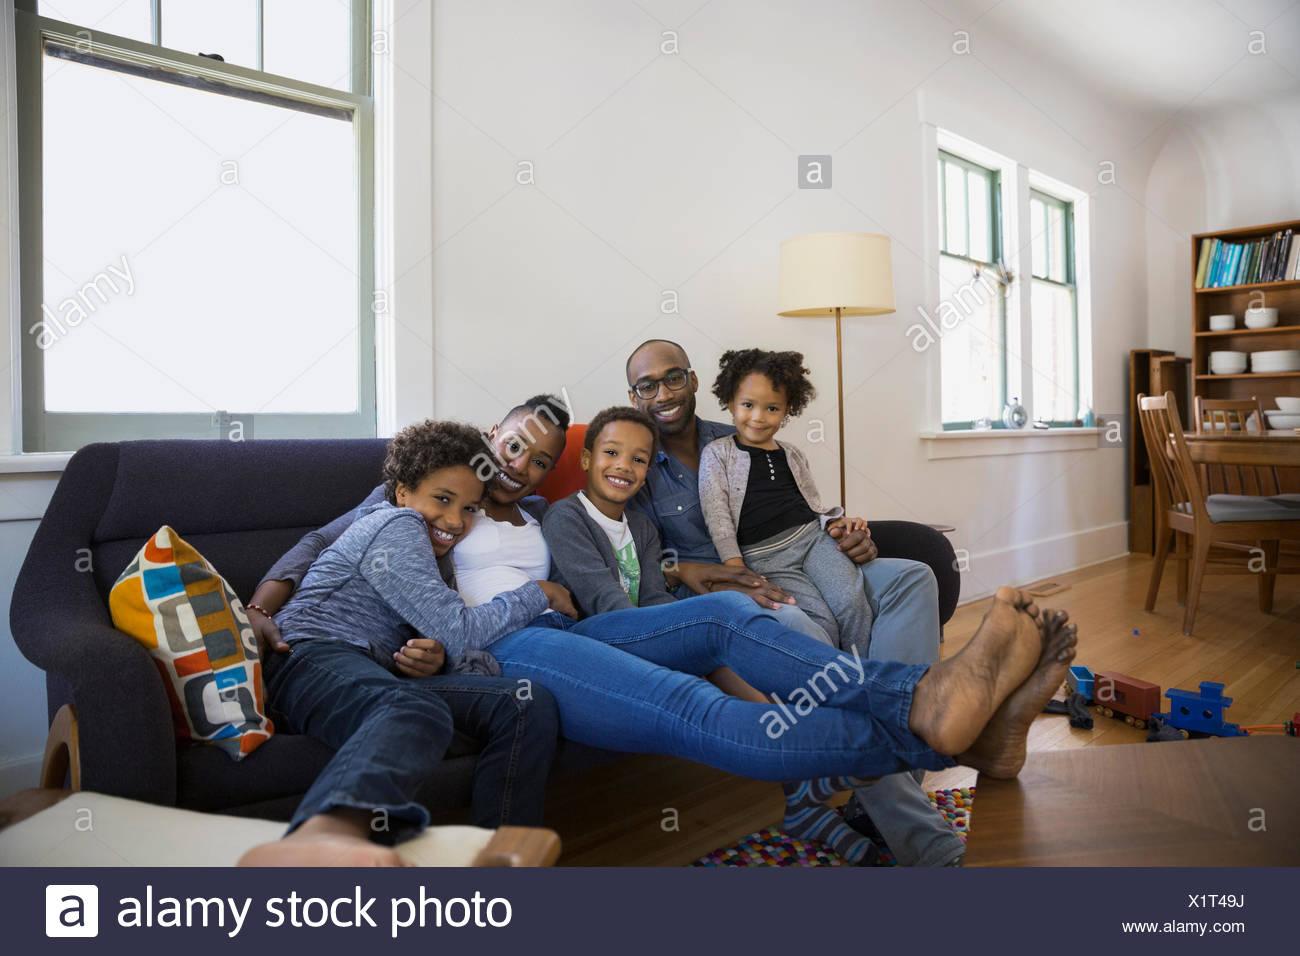 Portrait of smiling family on living room sofa - Stock Image